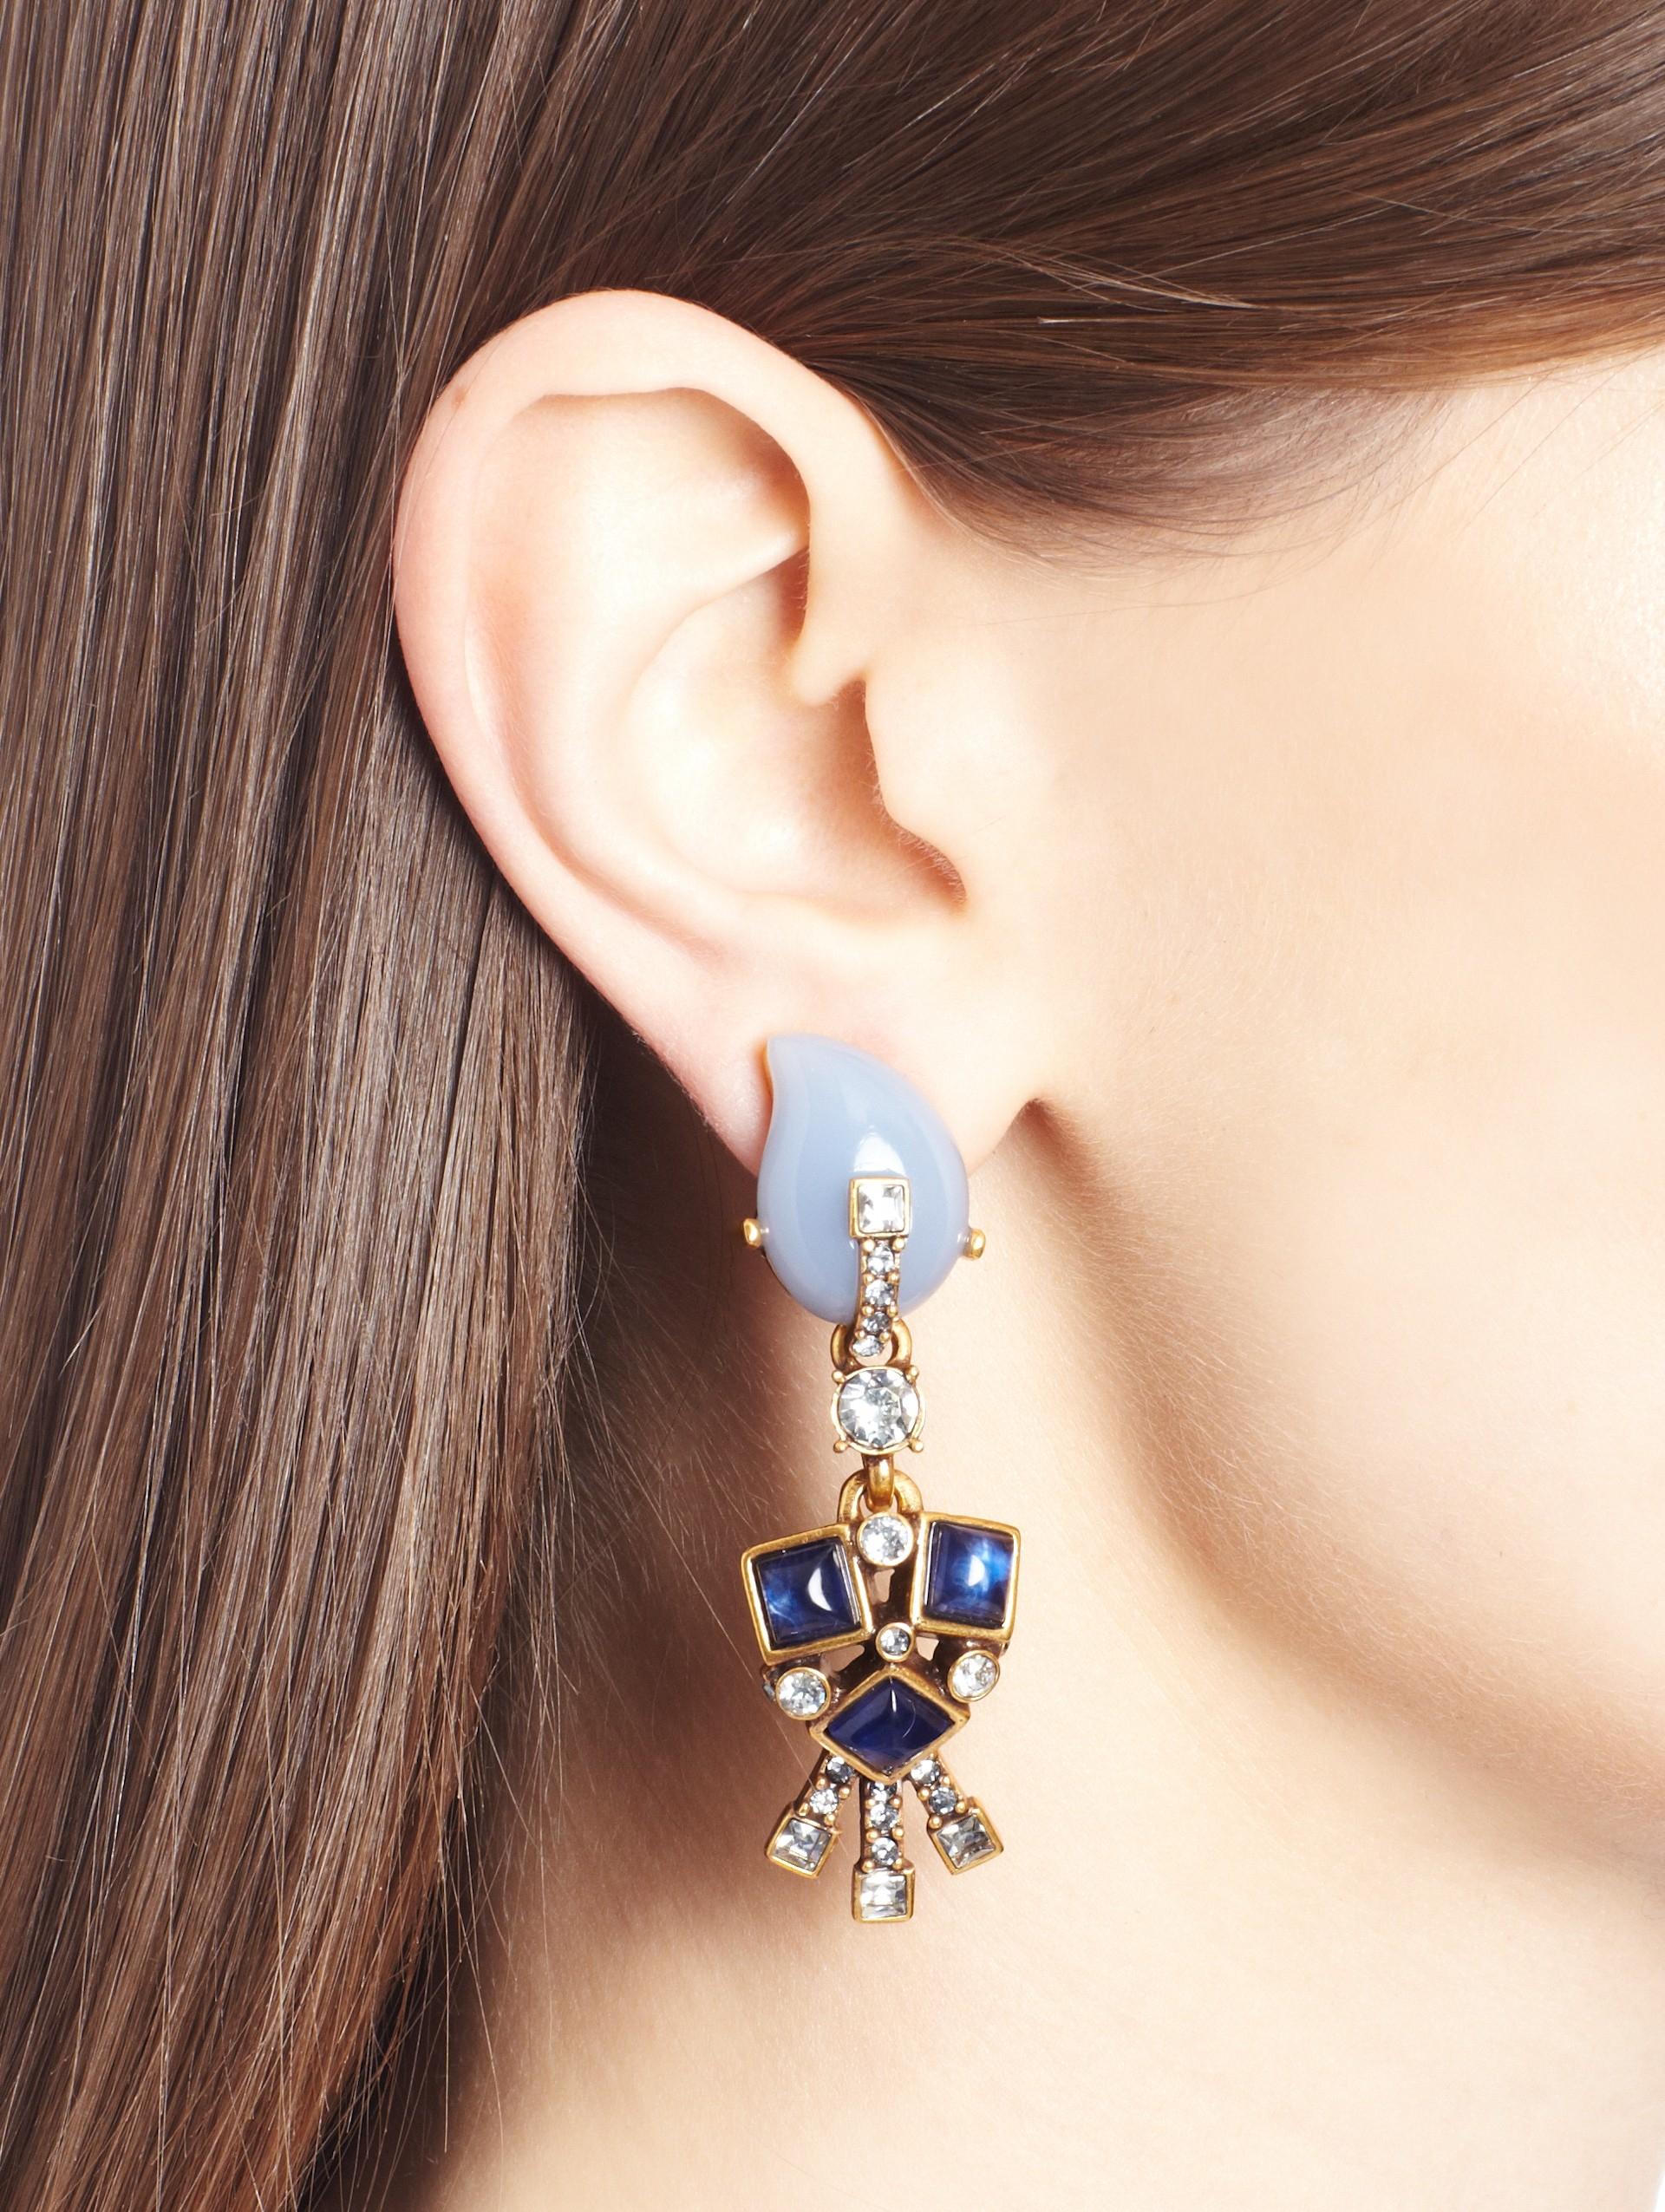 Periwinkle Jewelry Earrings Style Guru Fashion Glitz